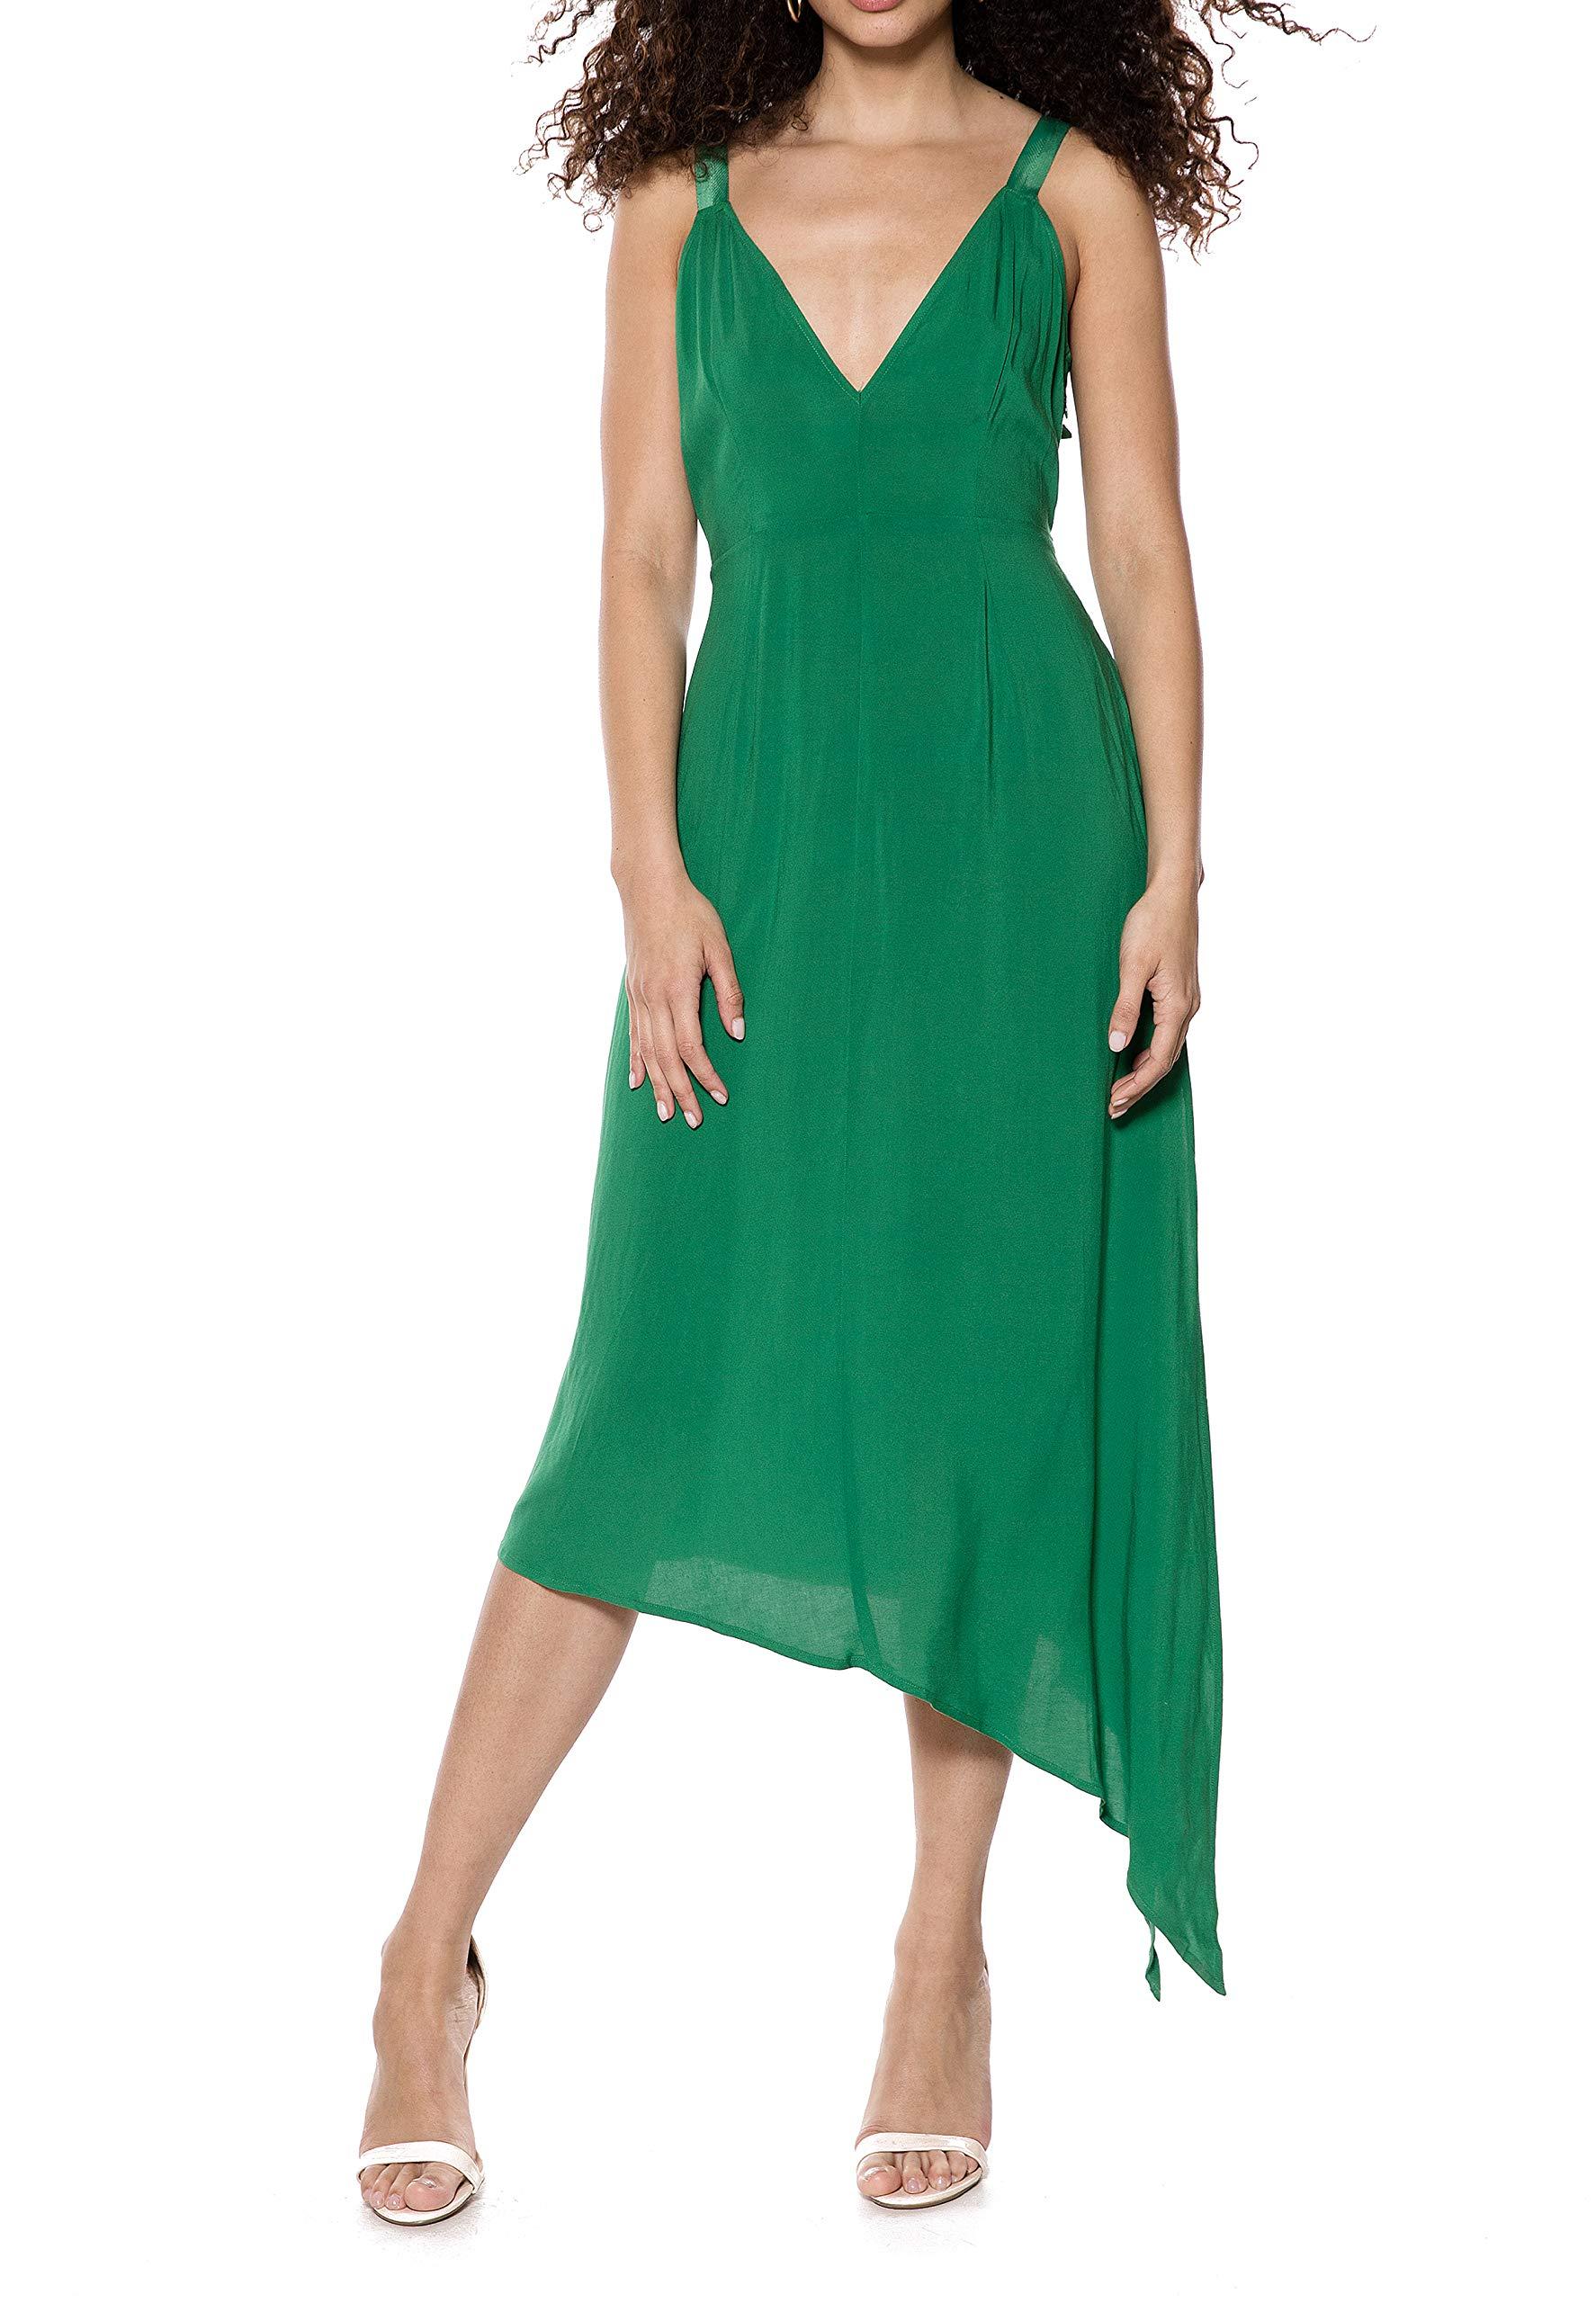 Robe De Ring Green Fabricant32Femme Ivyrevel D Dress 34434taille Asymmetric SoiréeVertverdant dxWBrCoe